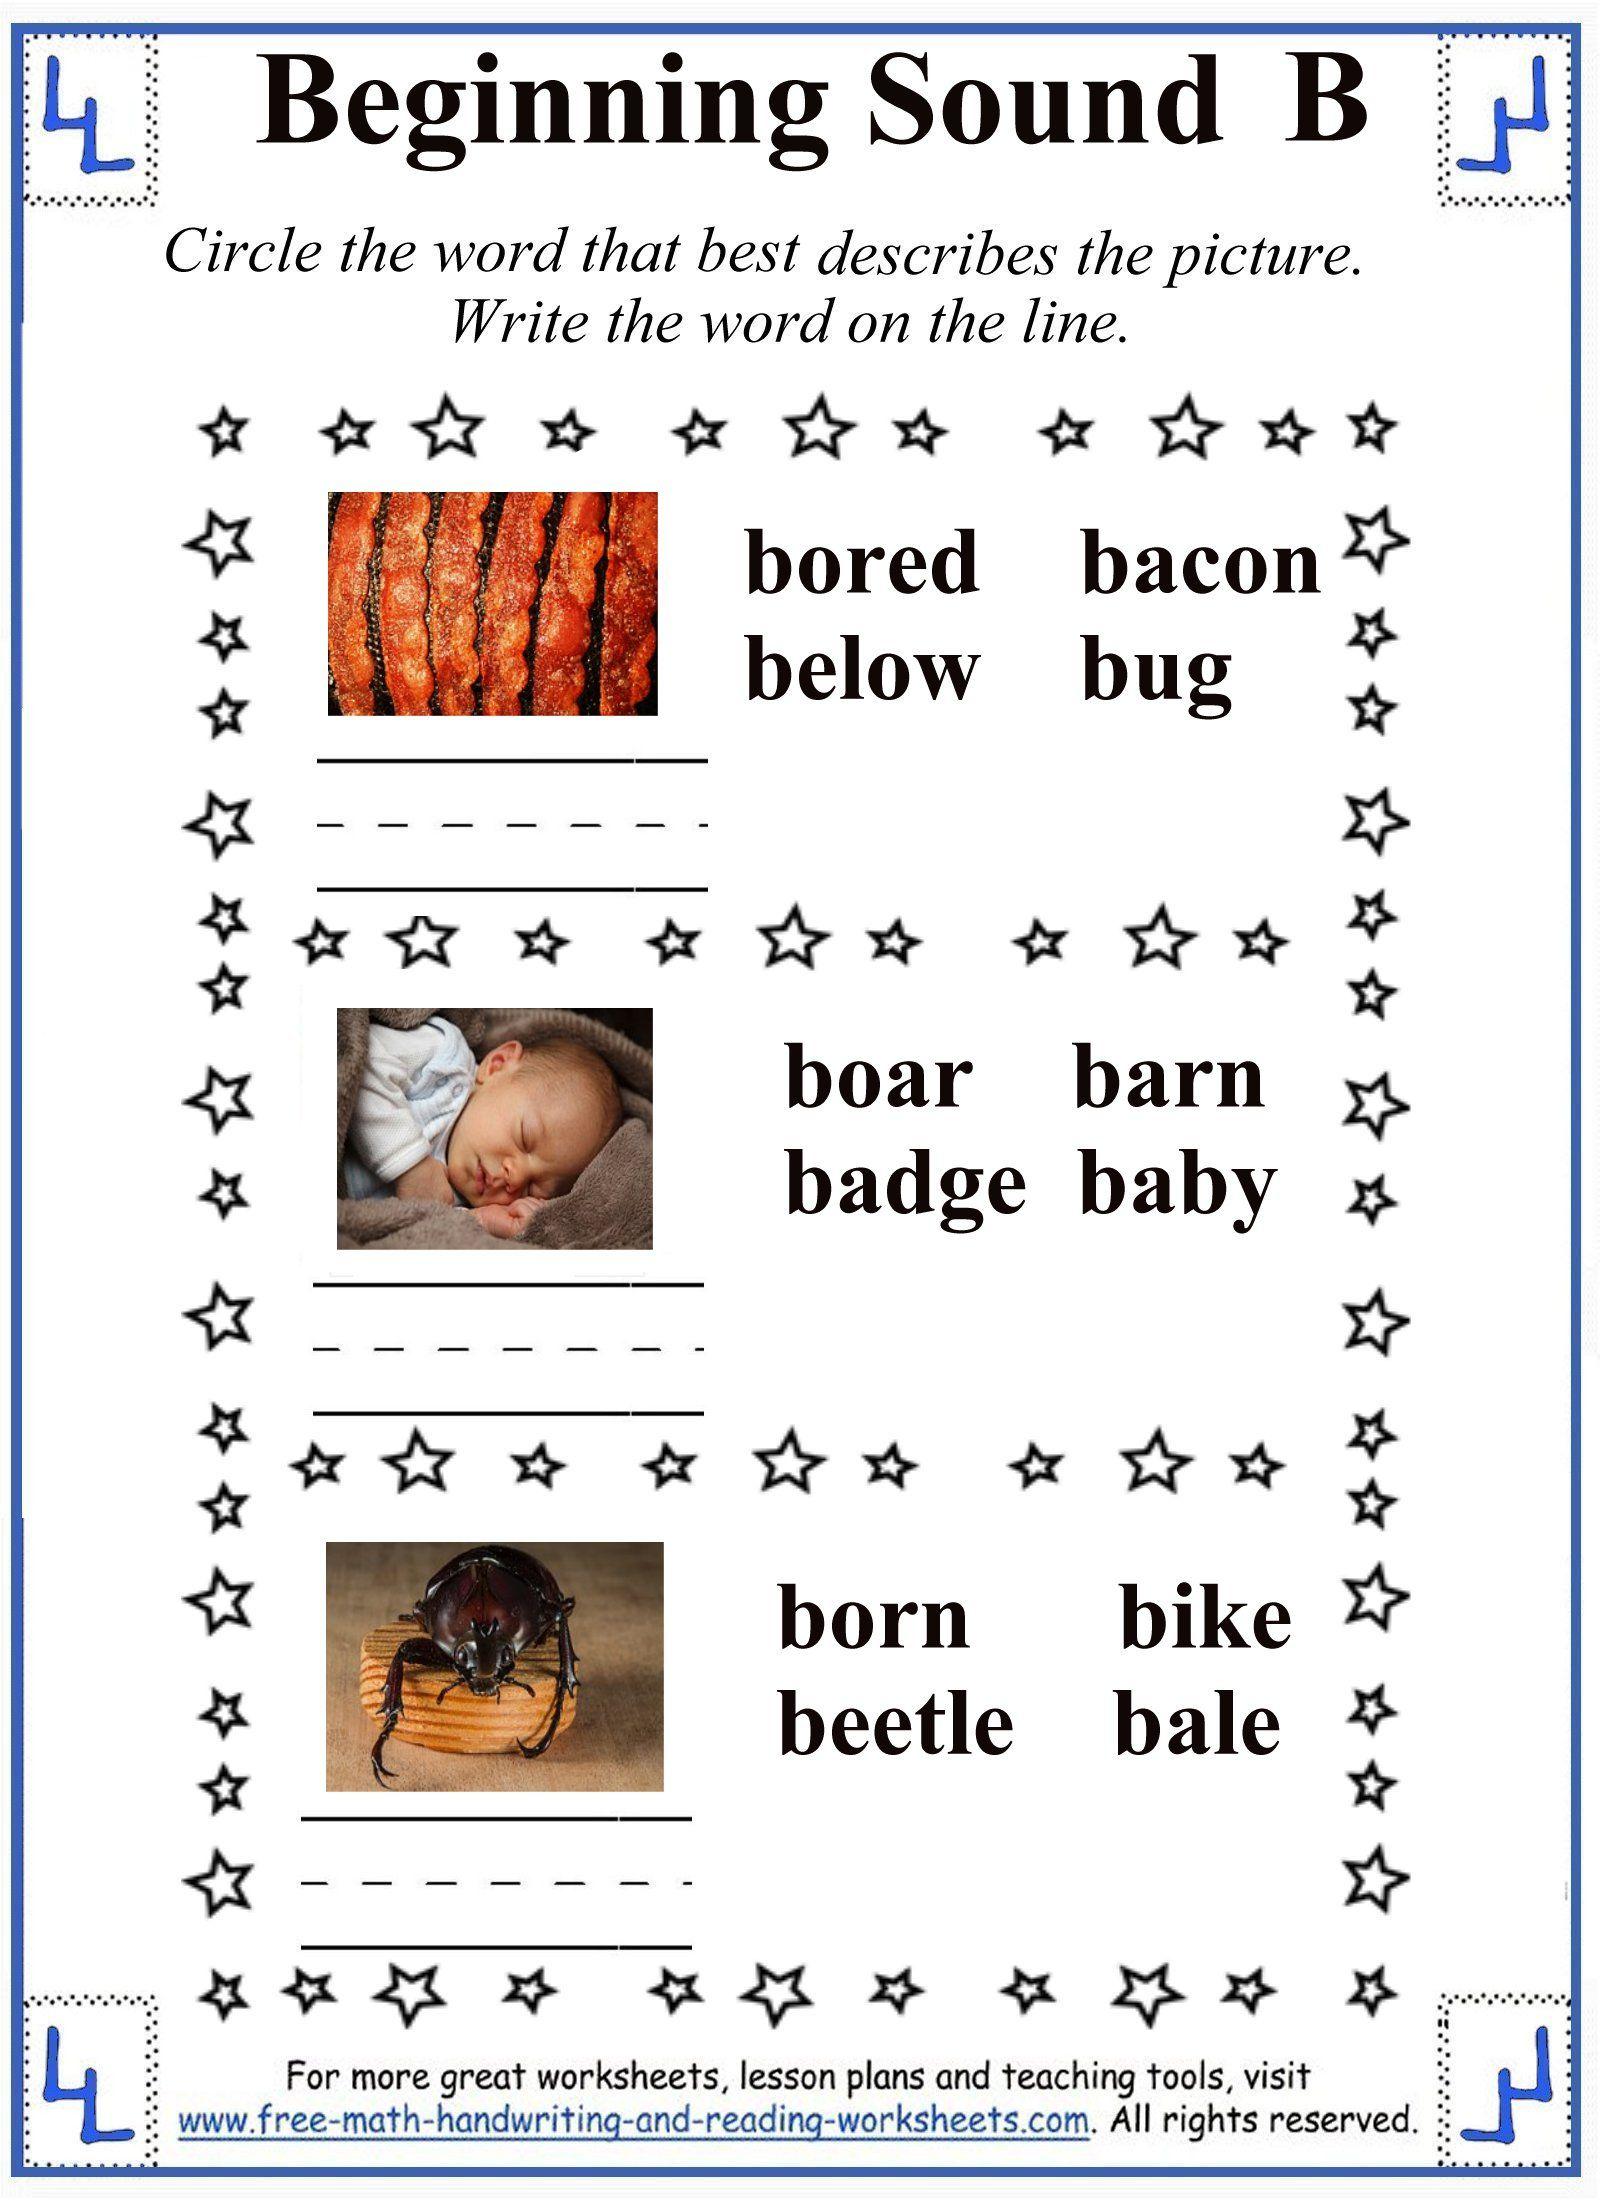 Worksheet Consonant Letters Worksheets letter b worksheets consonant letters pinterest worksheets